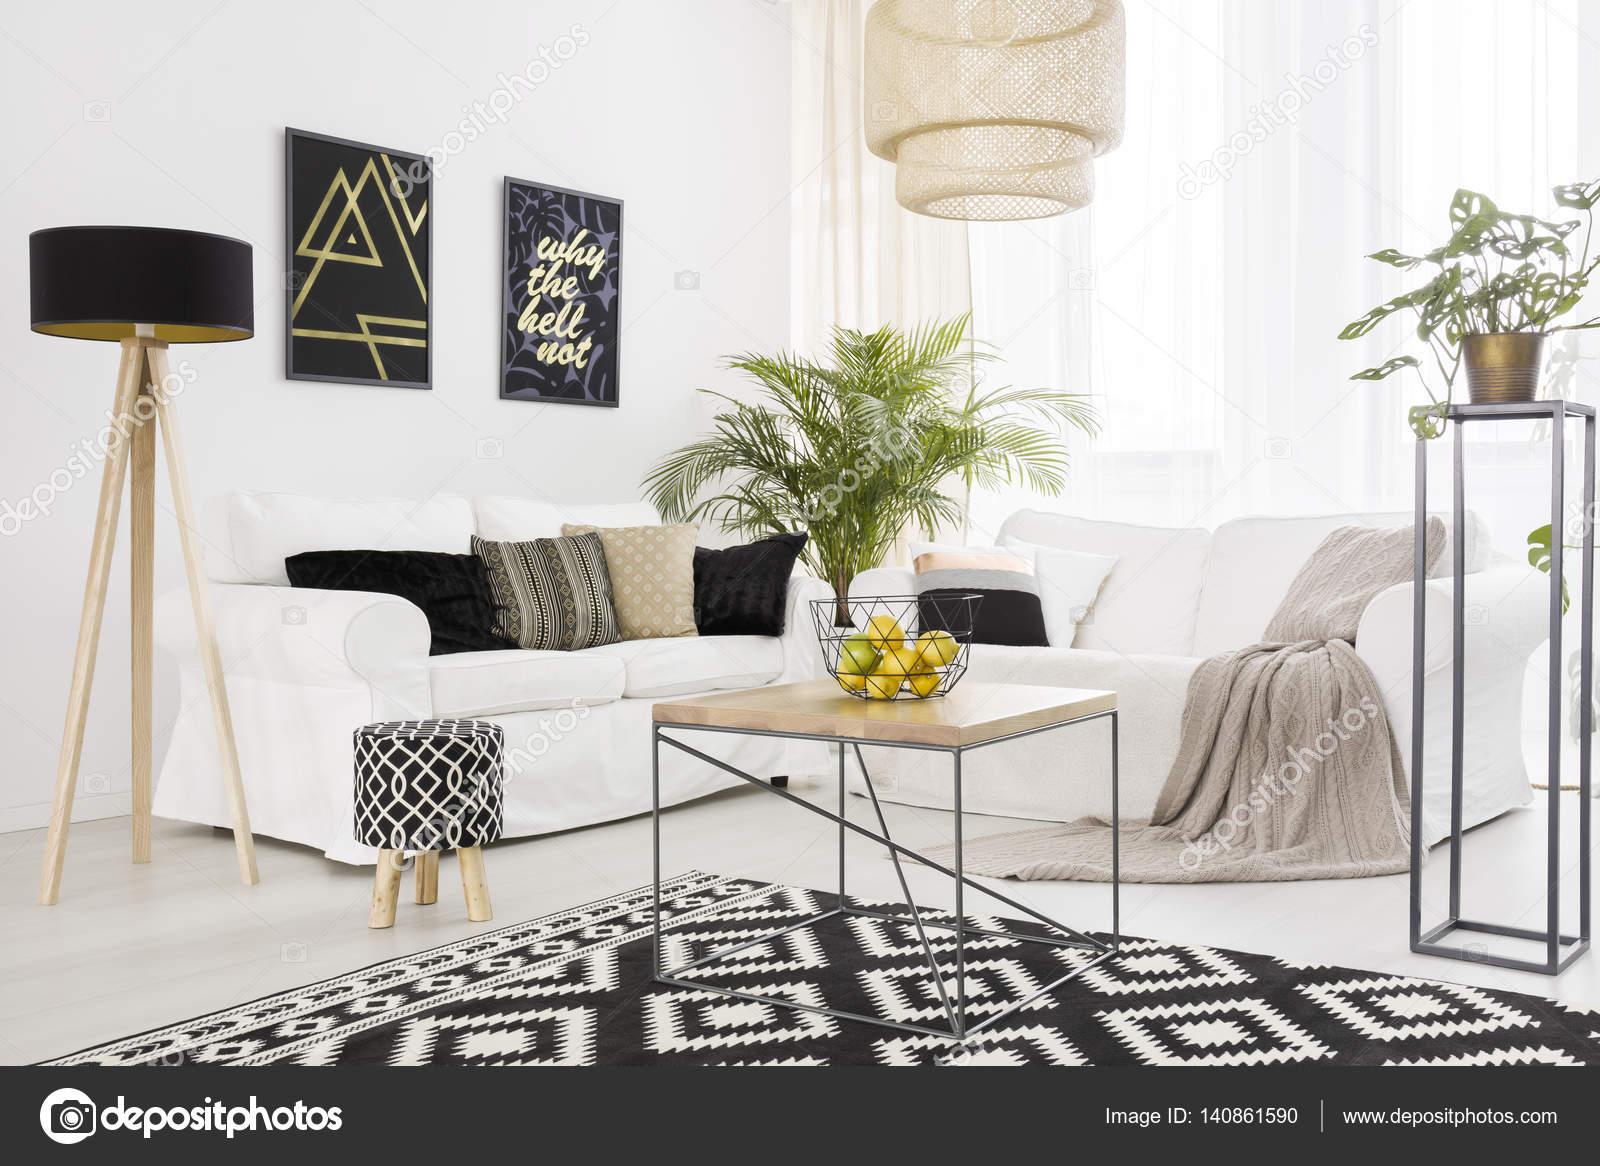 zwart-wit woonkamer — Stockfoto © photographee.eu #140861590